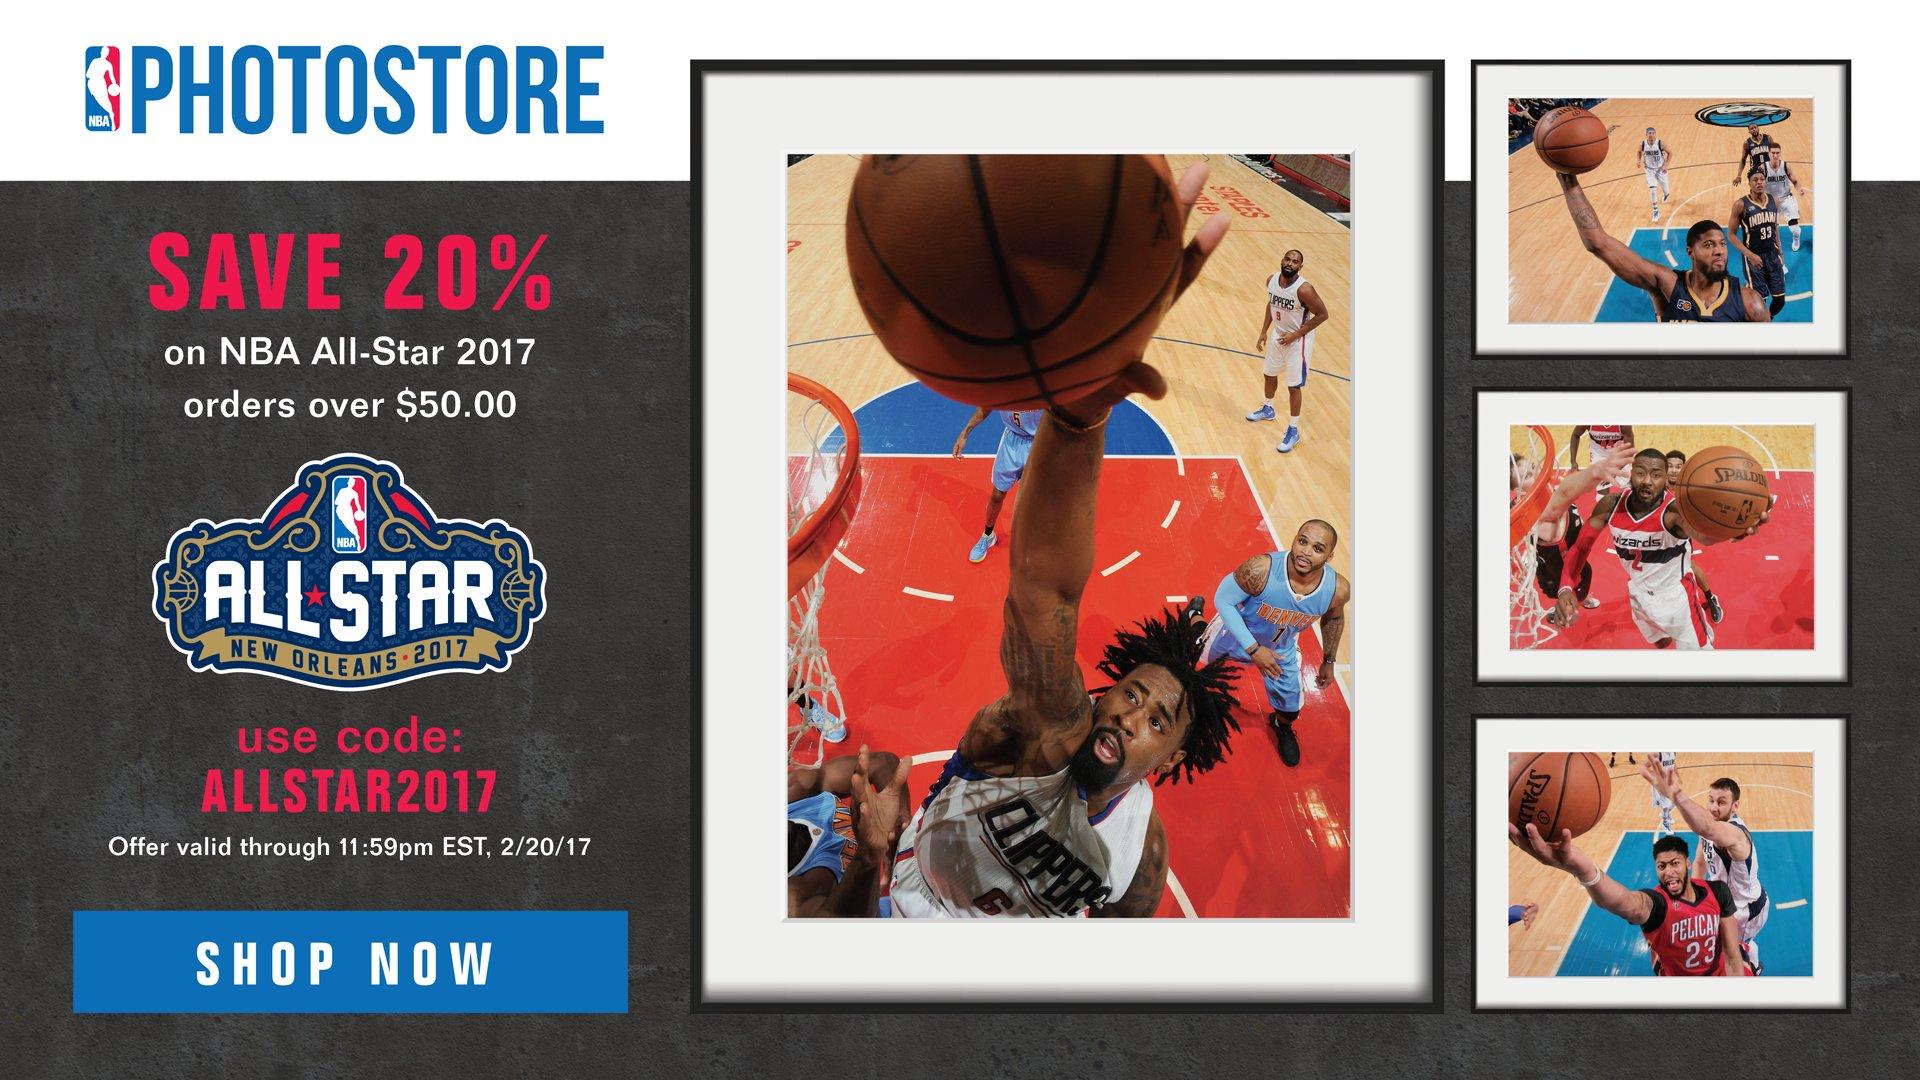 Save 20% on your #NBAAllStar NBA Photo Store orders by using code: ALLSTAR2017 https://t.co/QK3OTGEhW2 https://t.co/1o2b5dkOqN